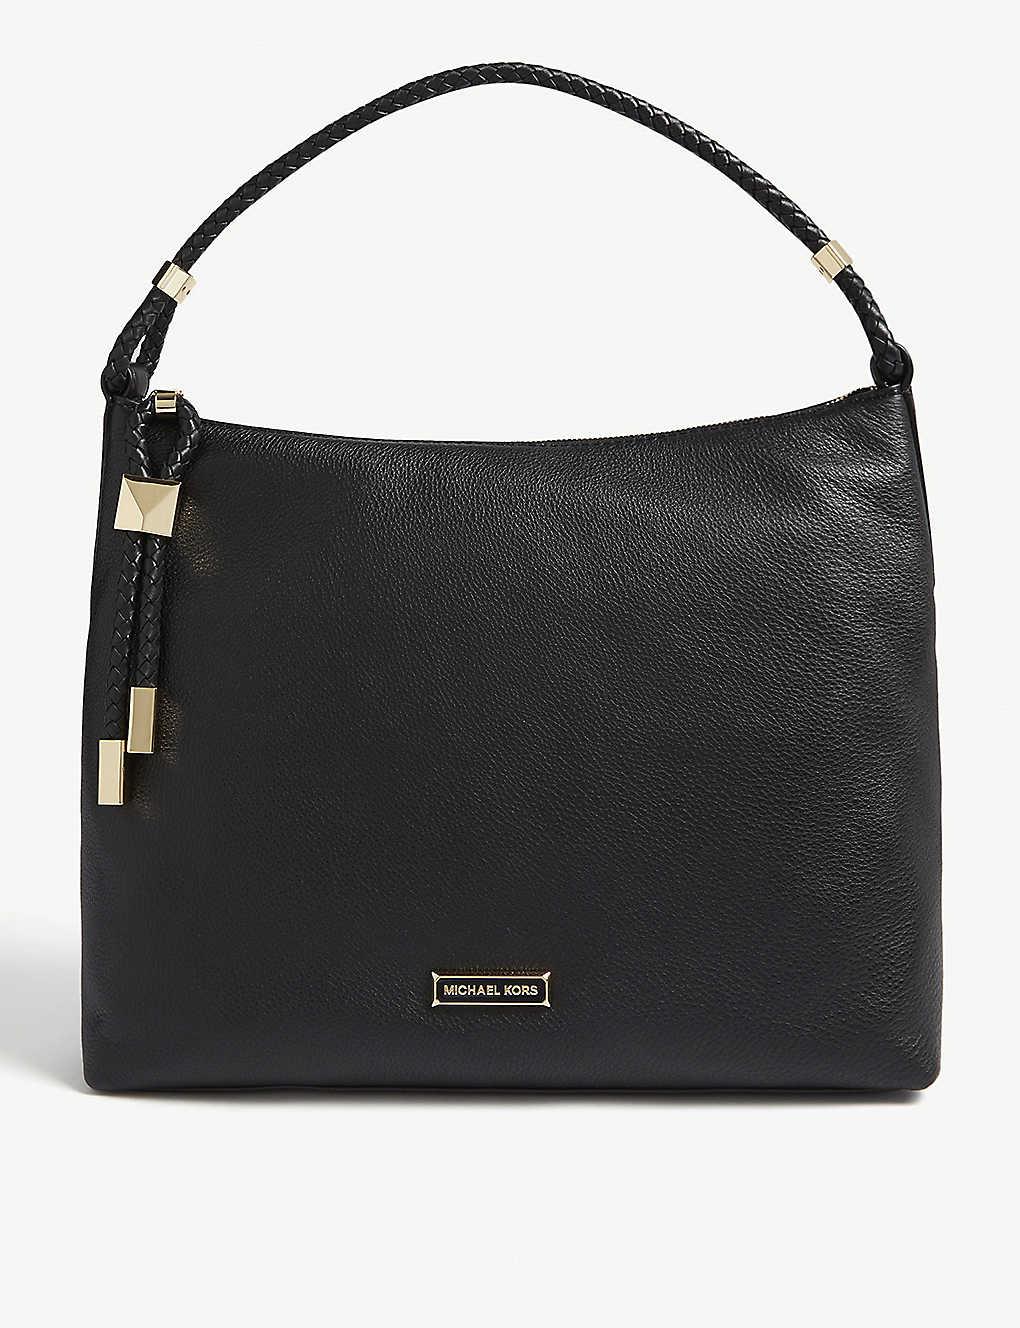 79a975a1c8a50d MICHAEL MICHAEL KORS - Lexington pebbled leather shoulder bag ...